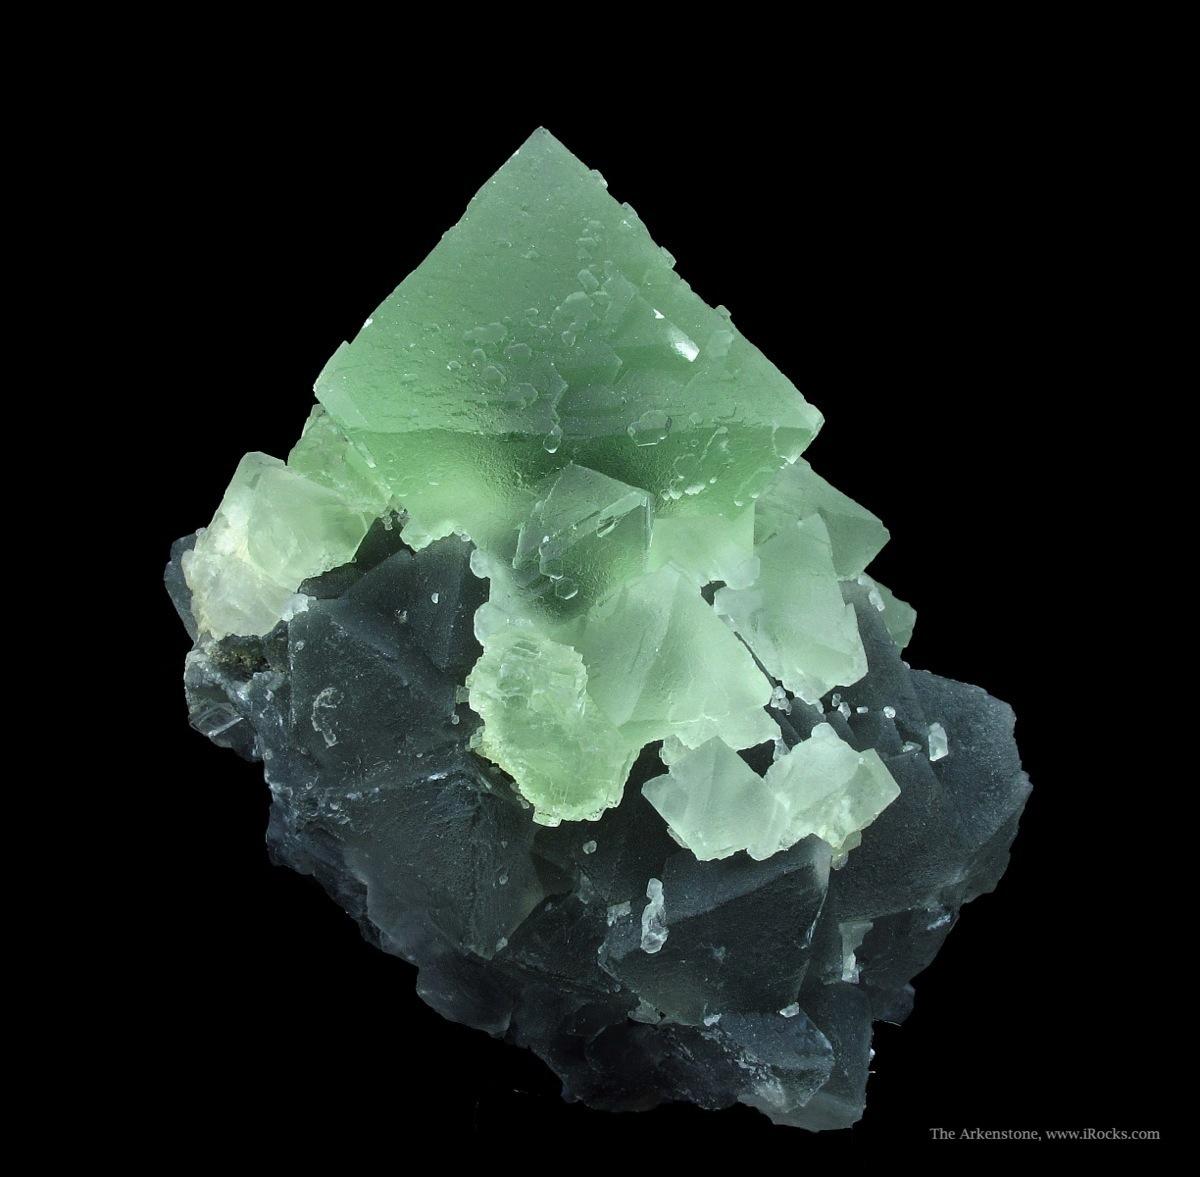 soreg15-43a-art-soregaroli-fine-minerals